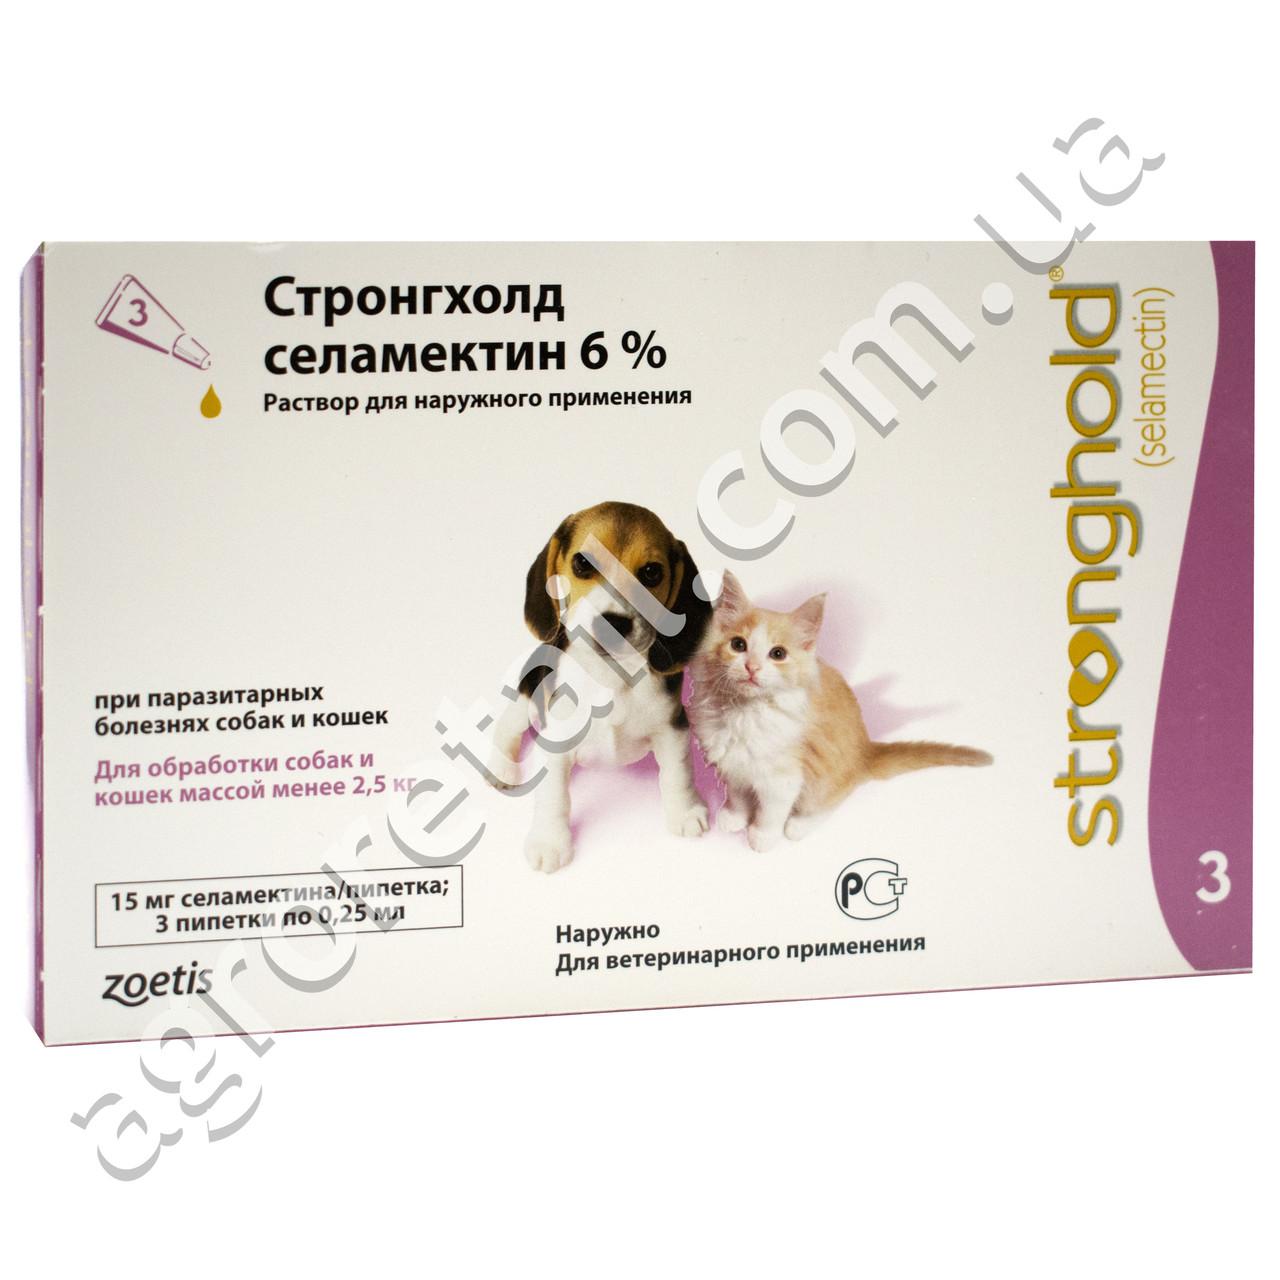 Стронгхолд капли для собак и кошек до 2.5 кг 3 пипетки по 0.25 мл